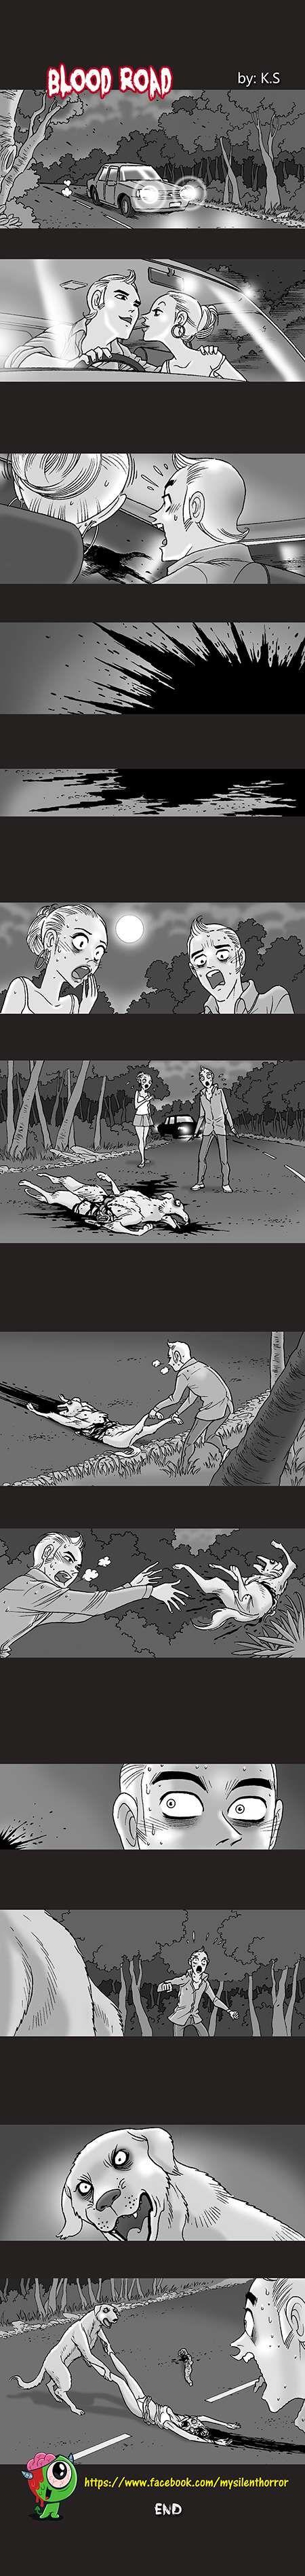 Silent Horror :: Blood Road   Tapastic Comics - image 1